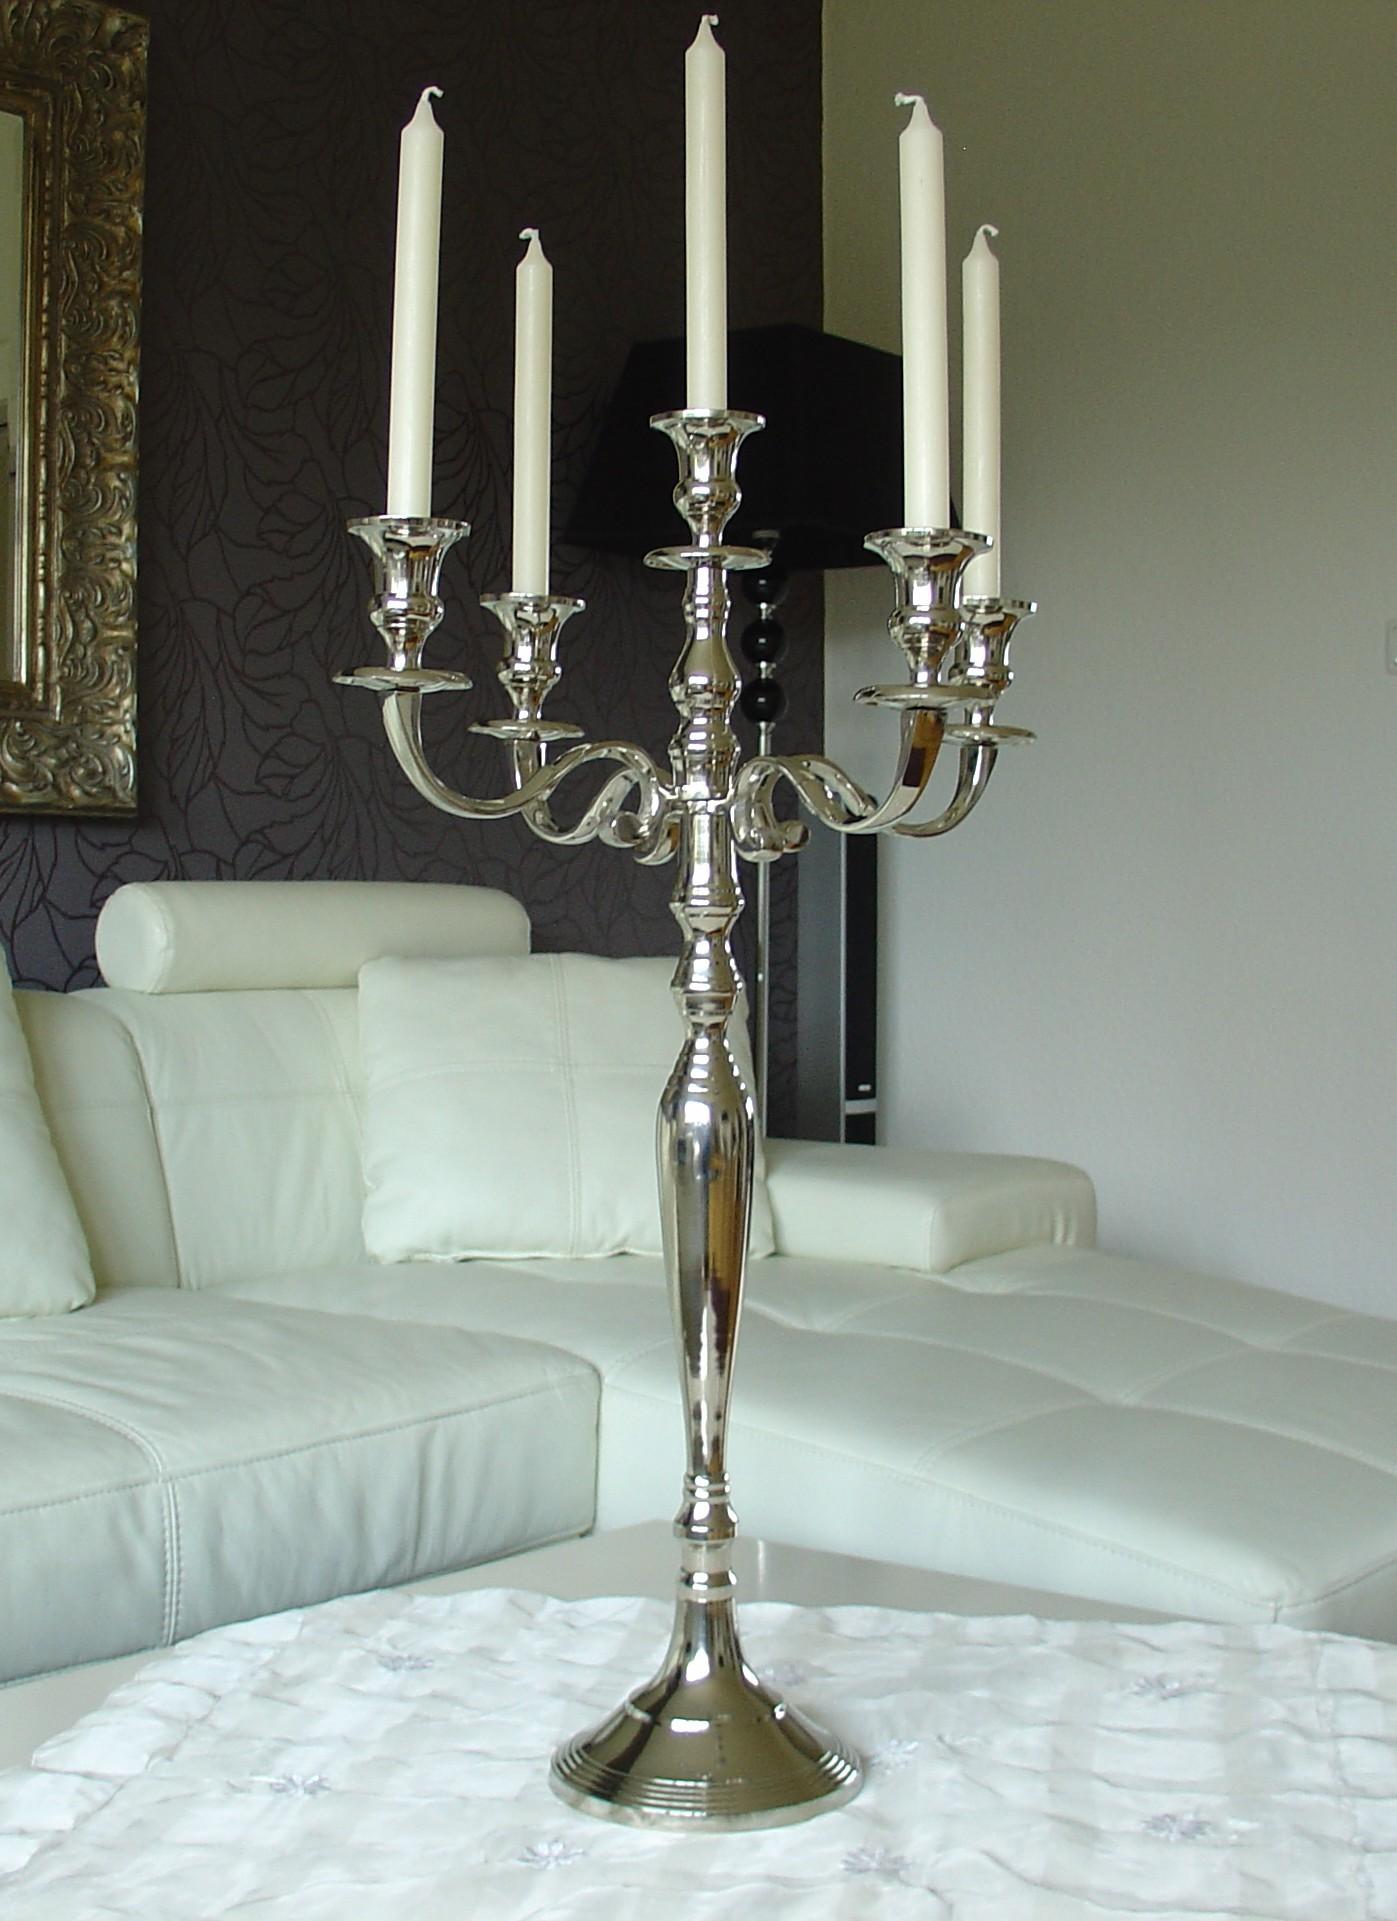 kerzenleuchter kerzenst nder 80 cm big event mit 4 x. Black Bedroom Furniture Sets. Home Design Ideas